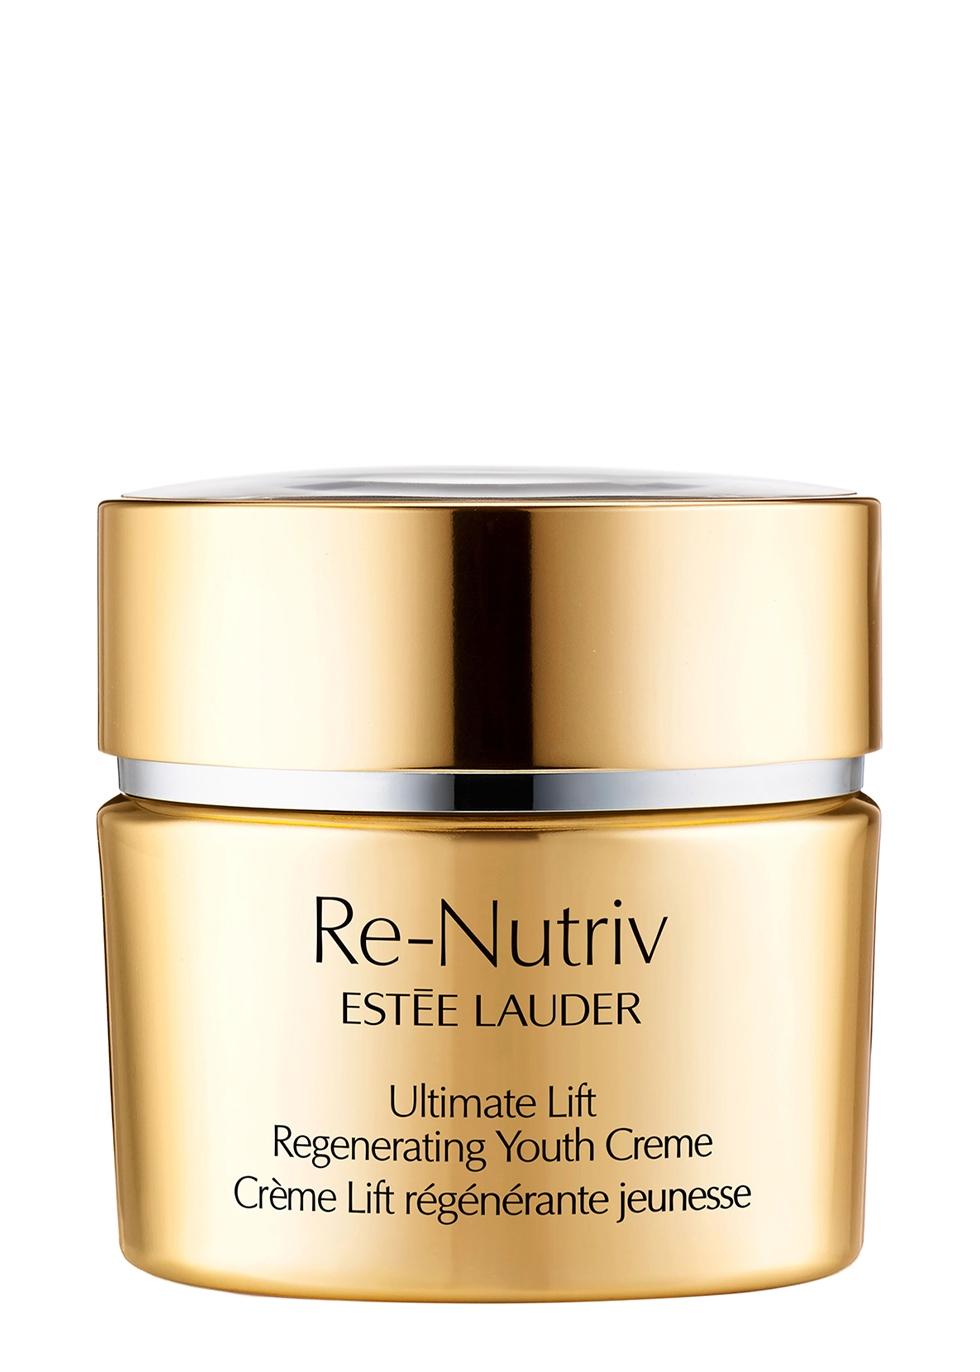 Re-Nutriv Ultimate Lift Regenerating Youth Creme 50ml